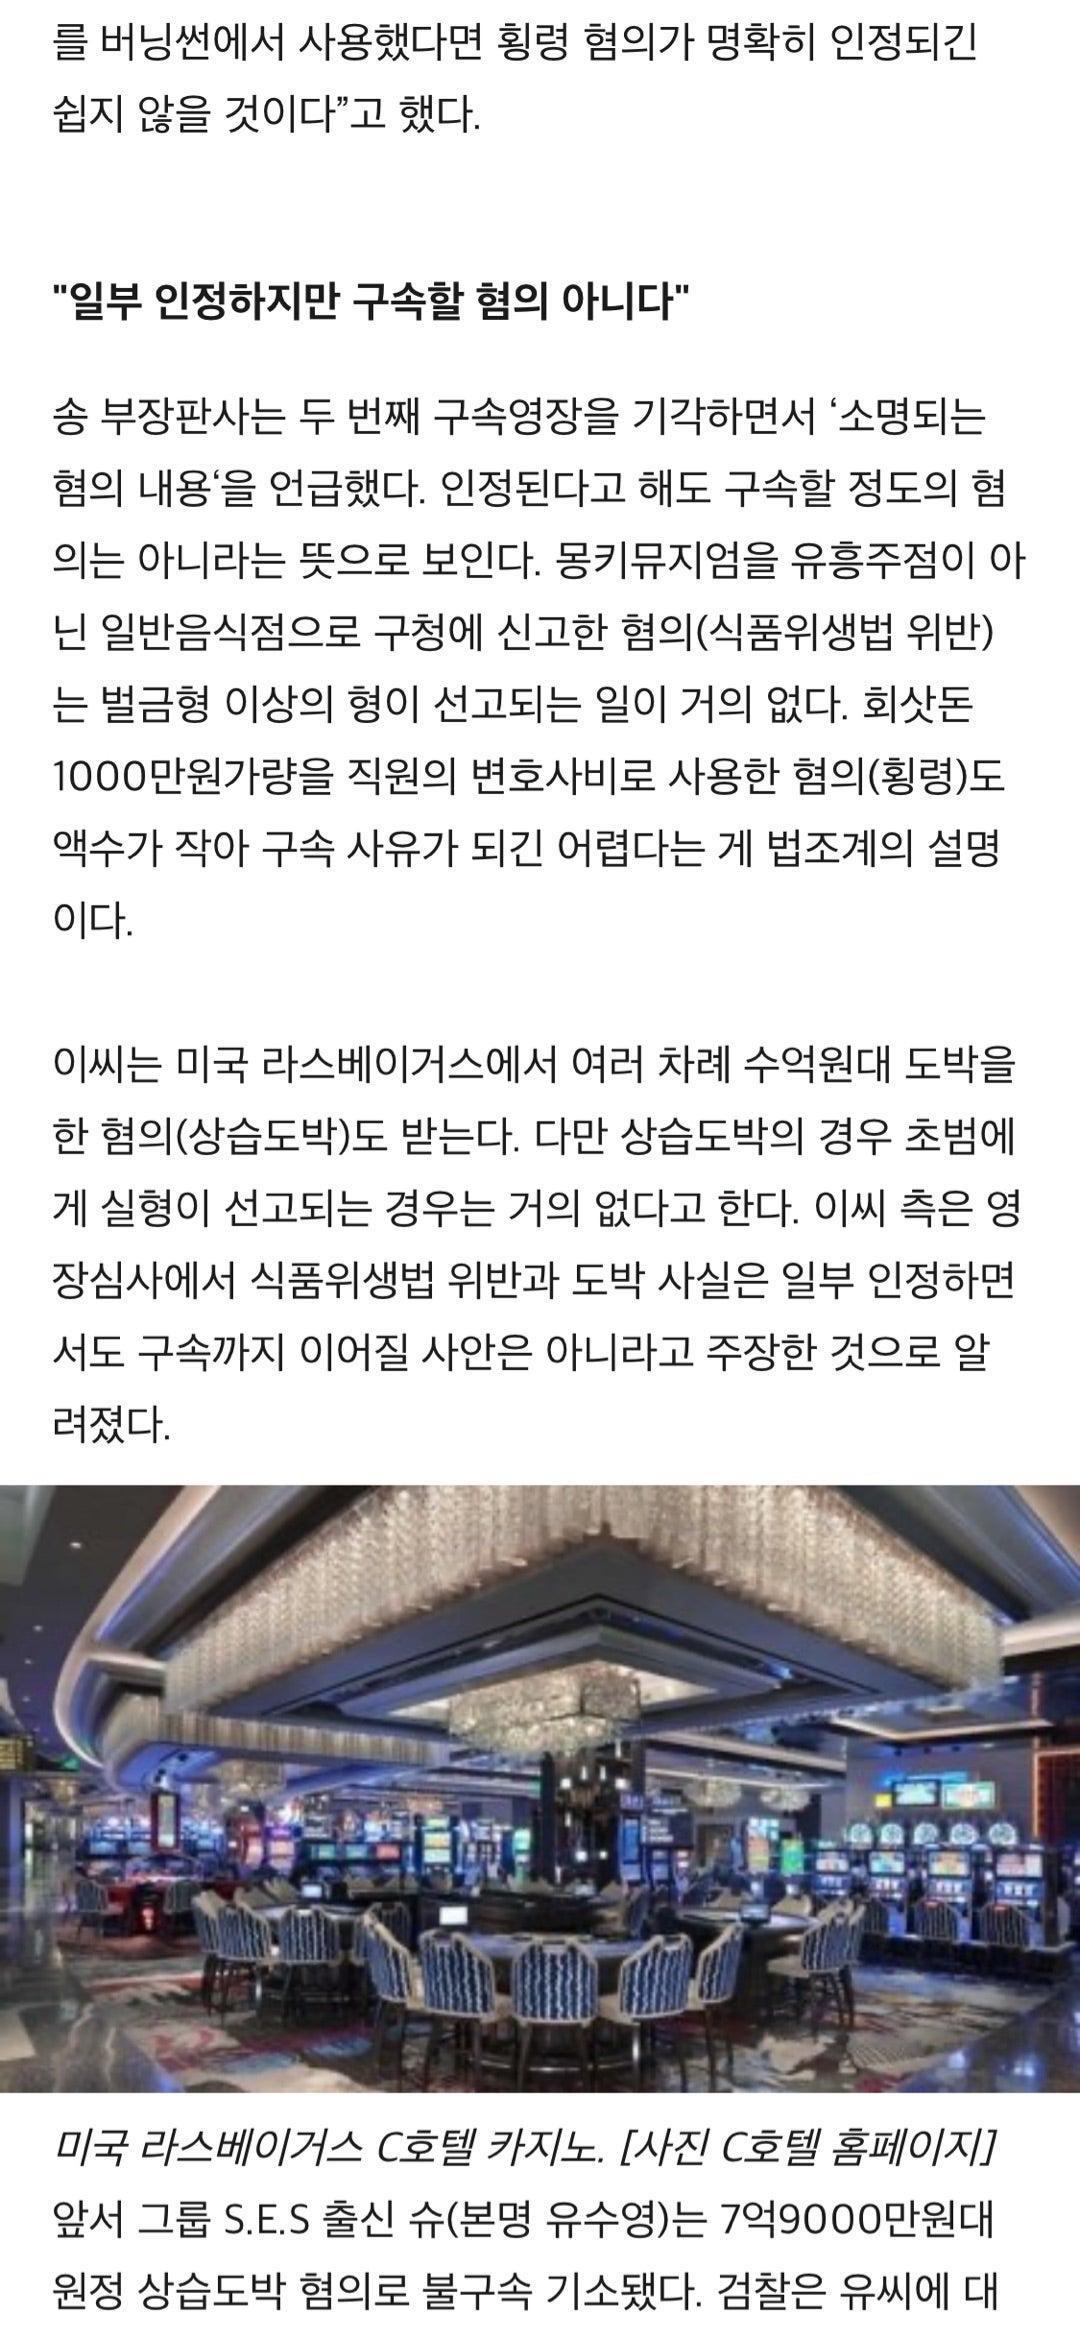 YG記事訳【SR】2度目のスンリに対する拘束令状申請が棄却された事由について